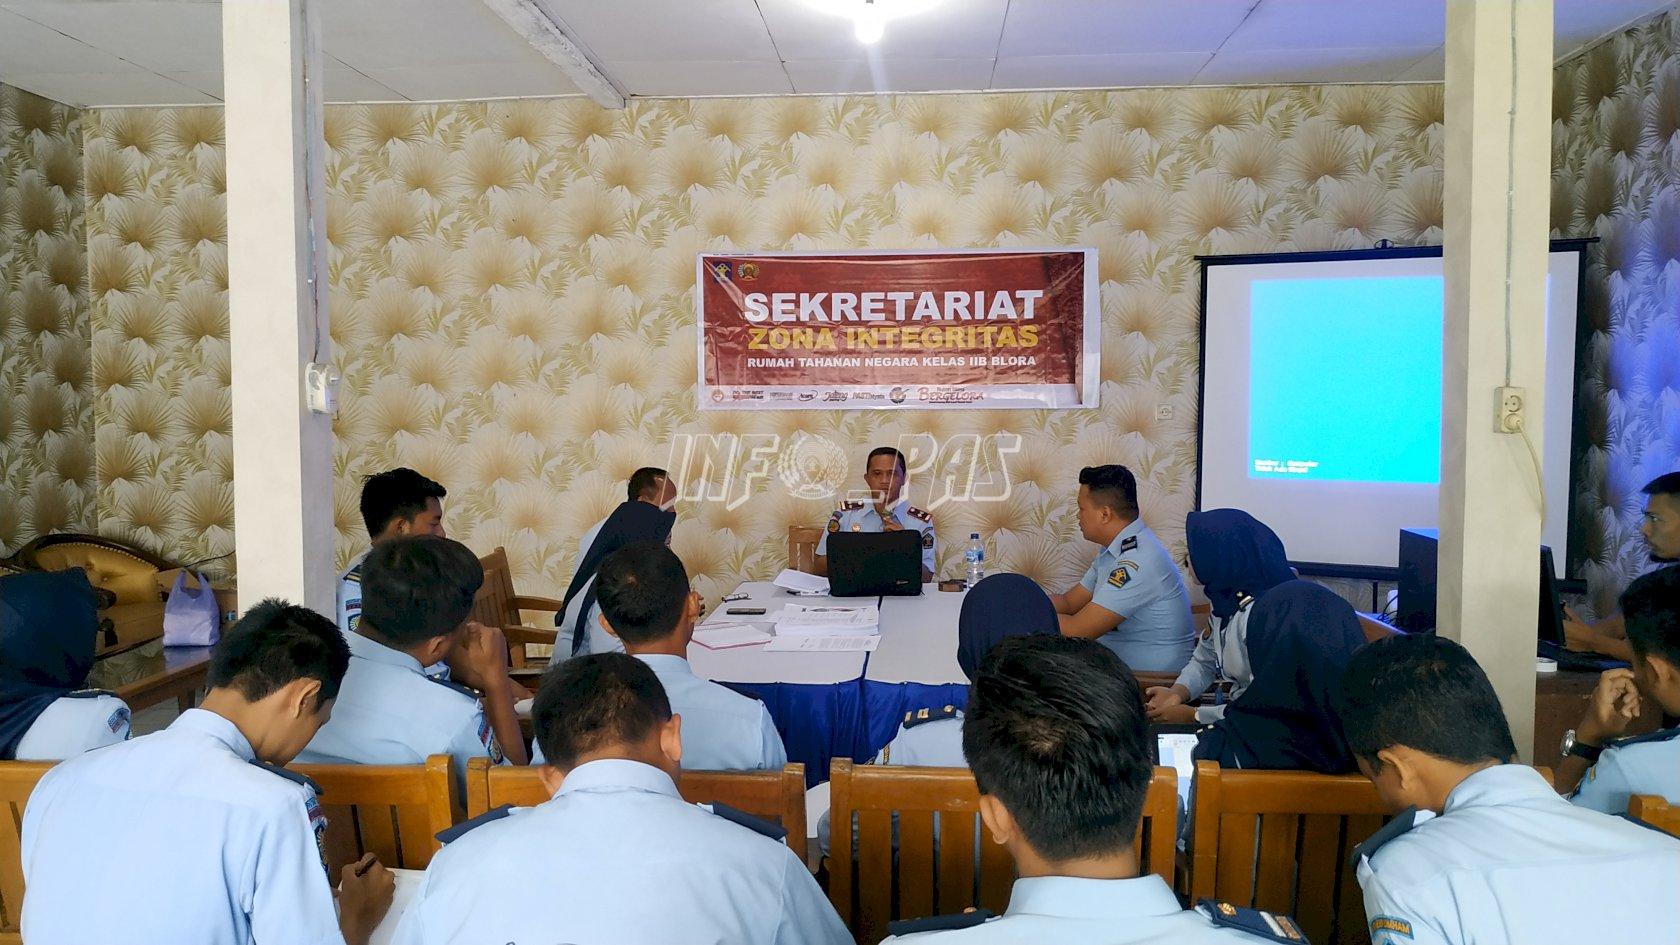 Permudah Kerja Tim Pokja, Rutan Blora Resmikan Sekretariat ZI WBK/WBBM